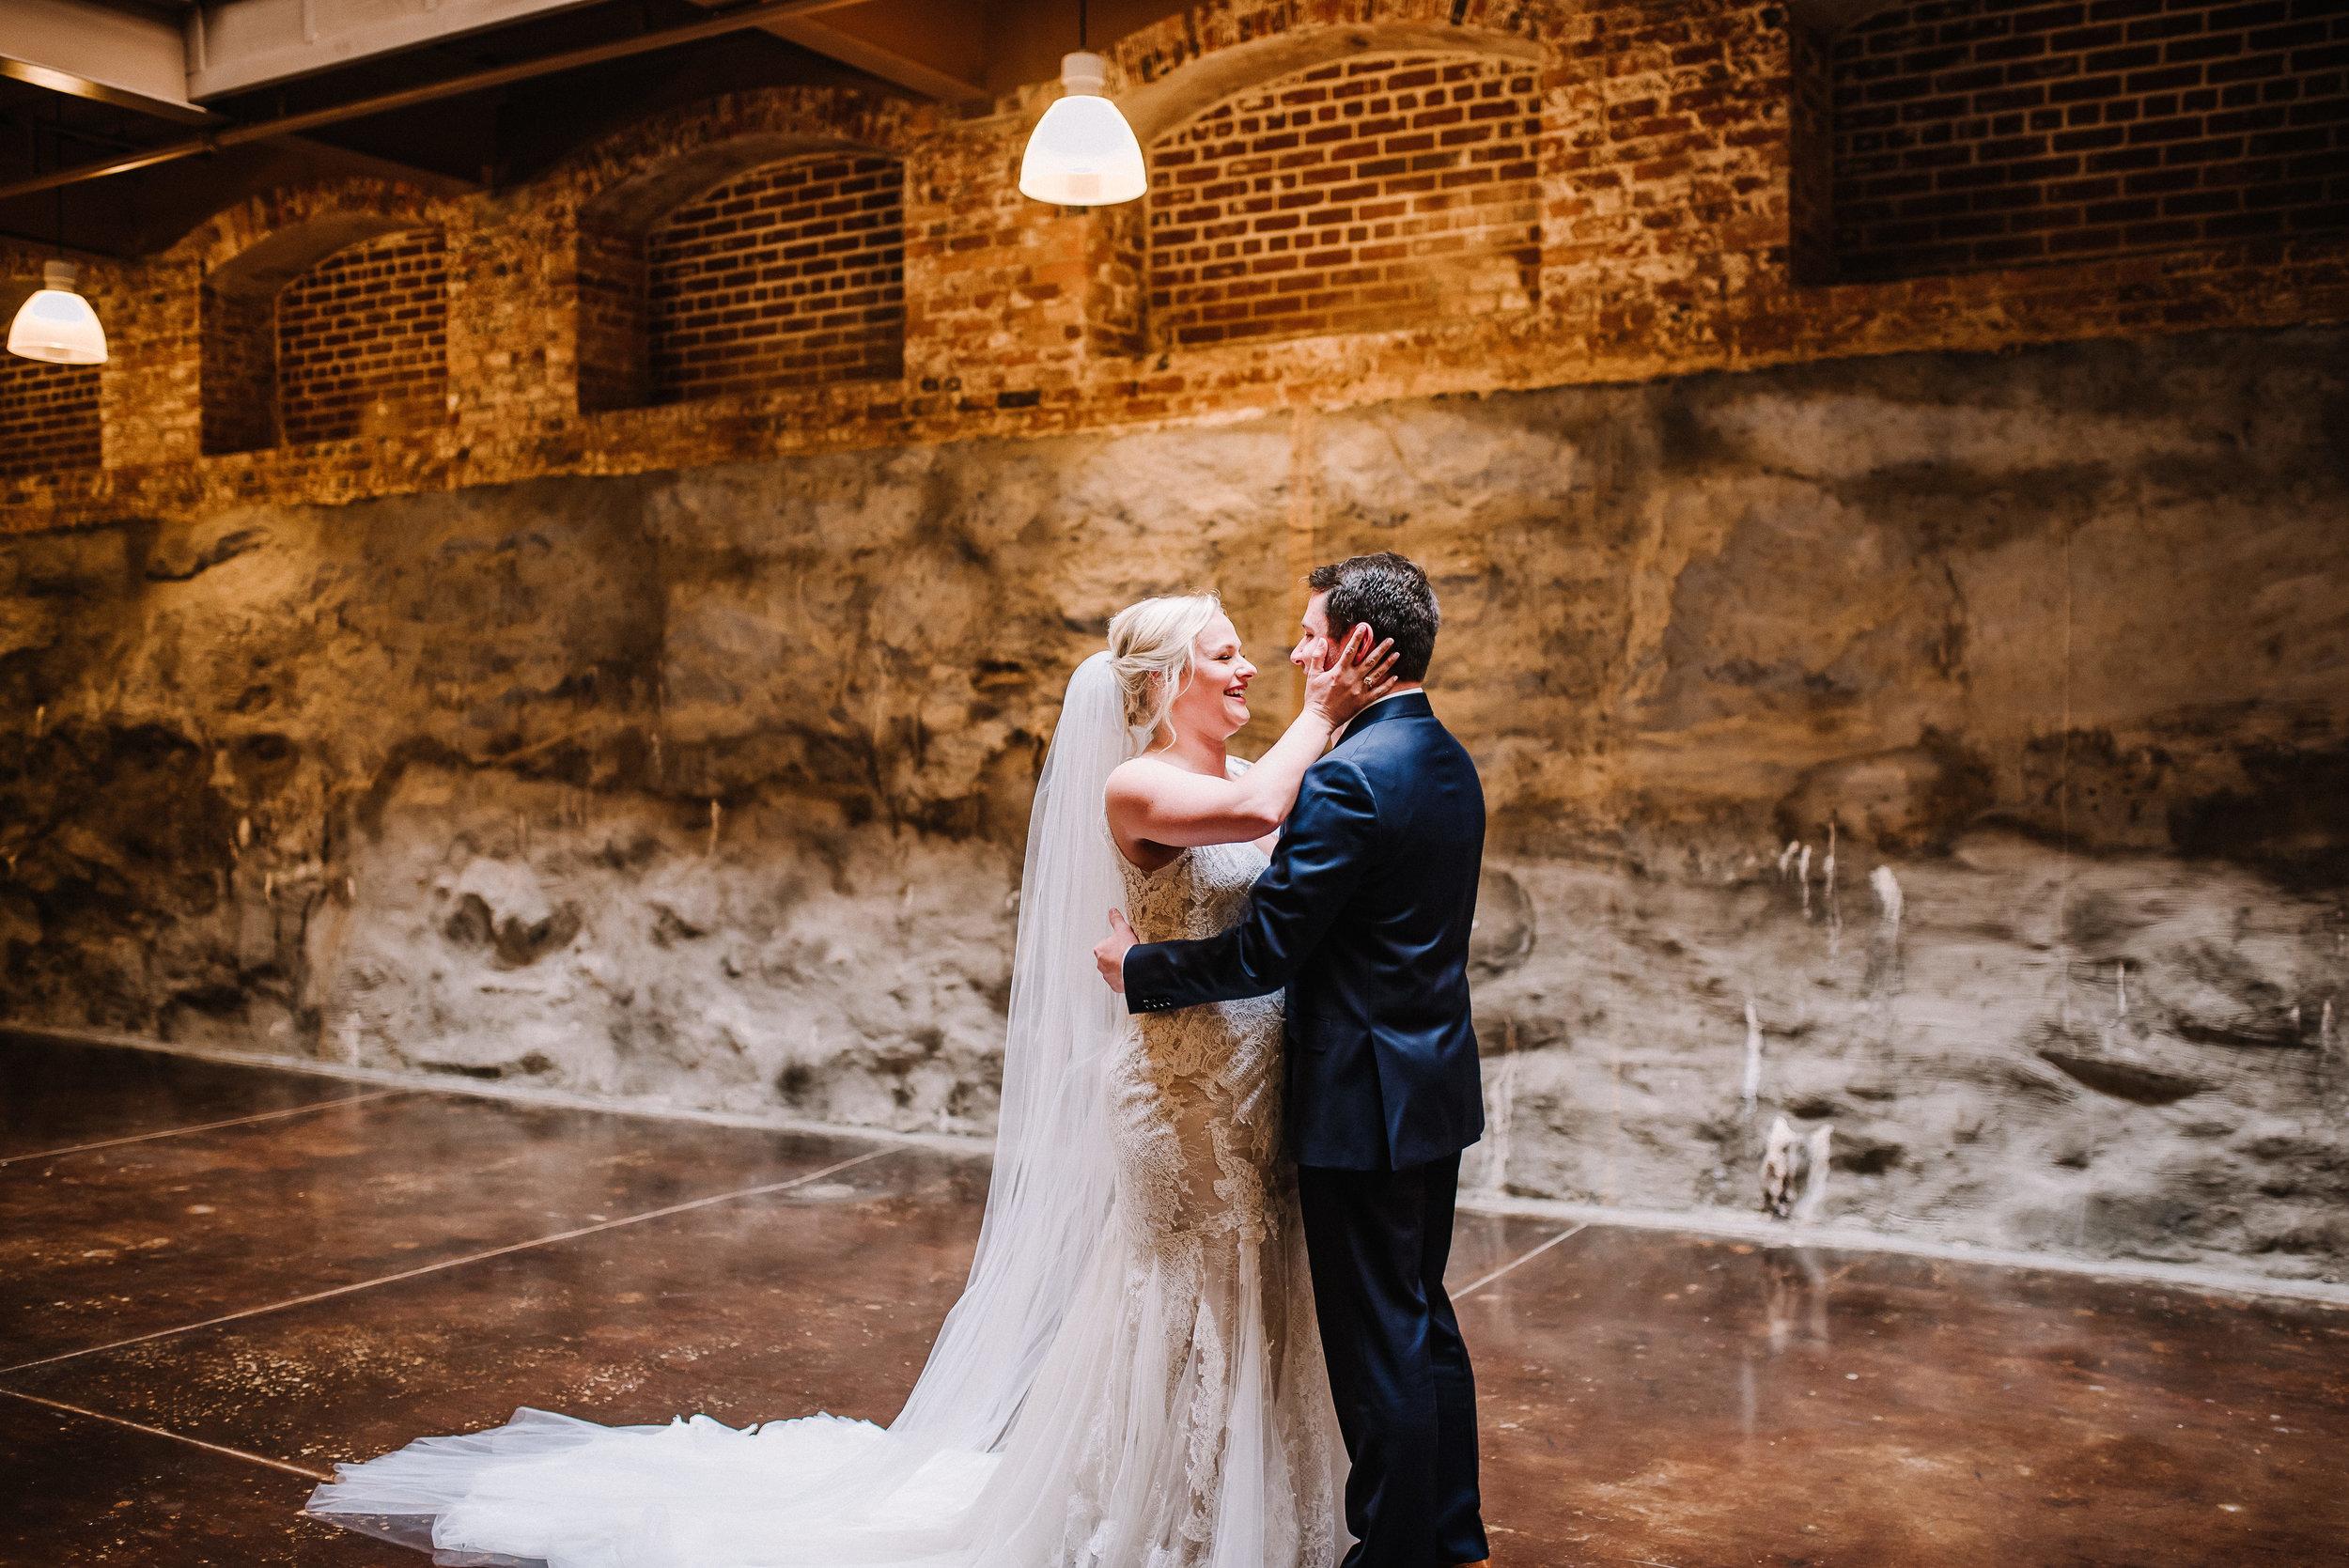 Morgan Wedding_Mill at Yellow River_Ashley Benham Photography-292.jpg